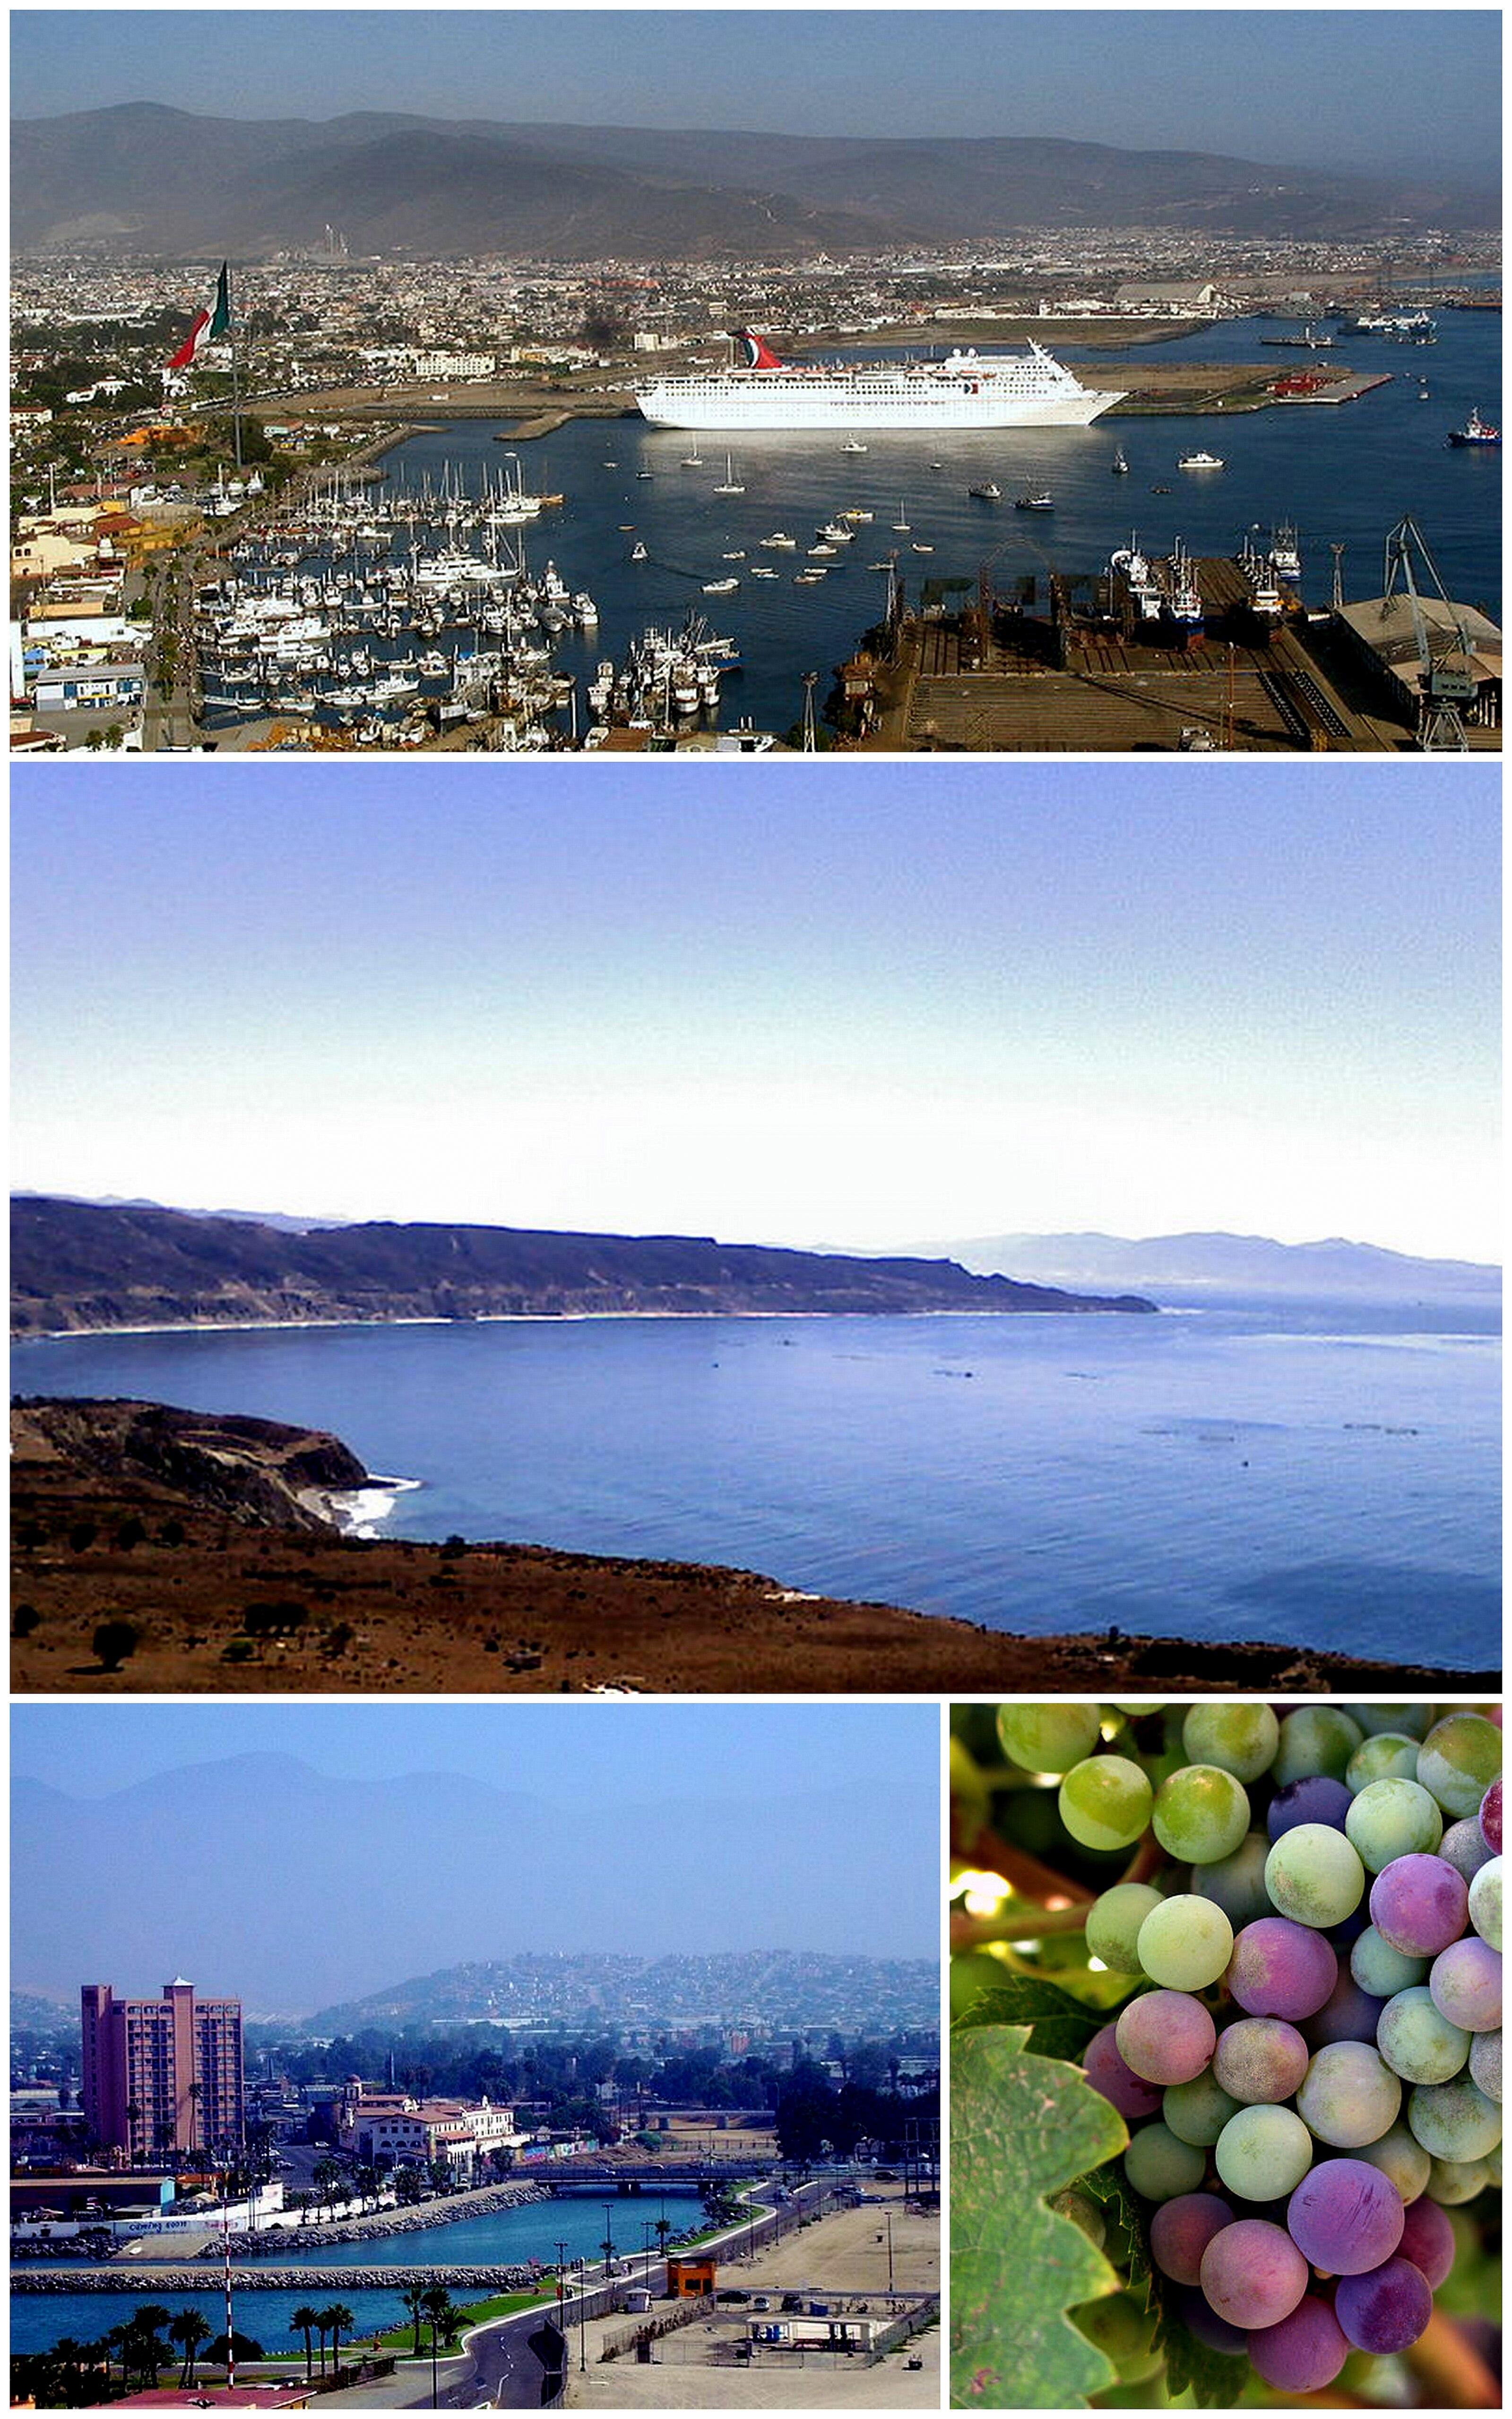 Ensenada, Baja California - The complete information and online sale